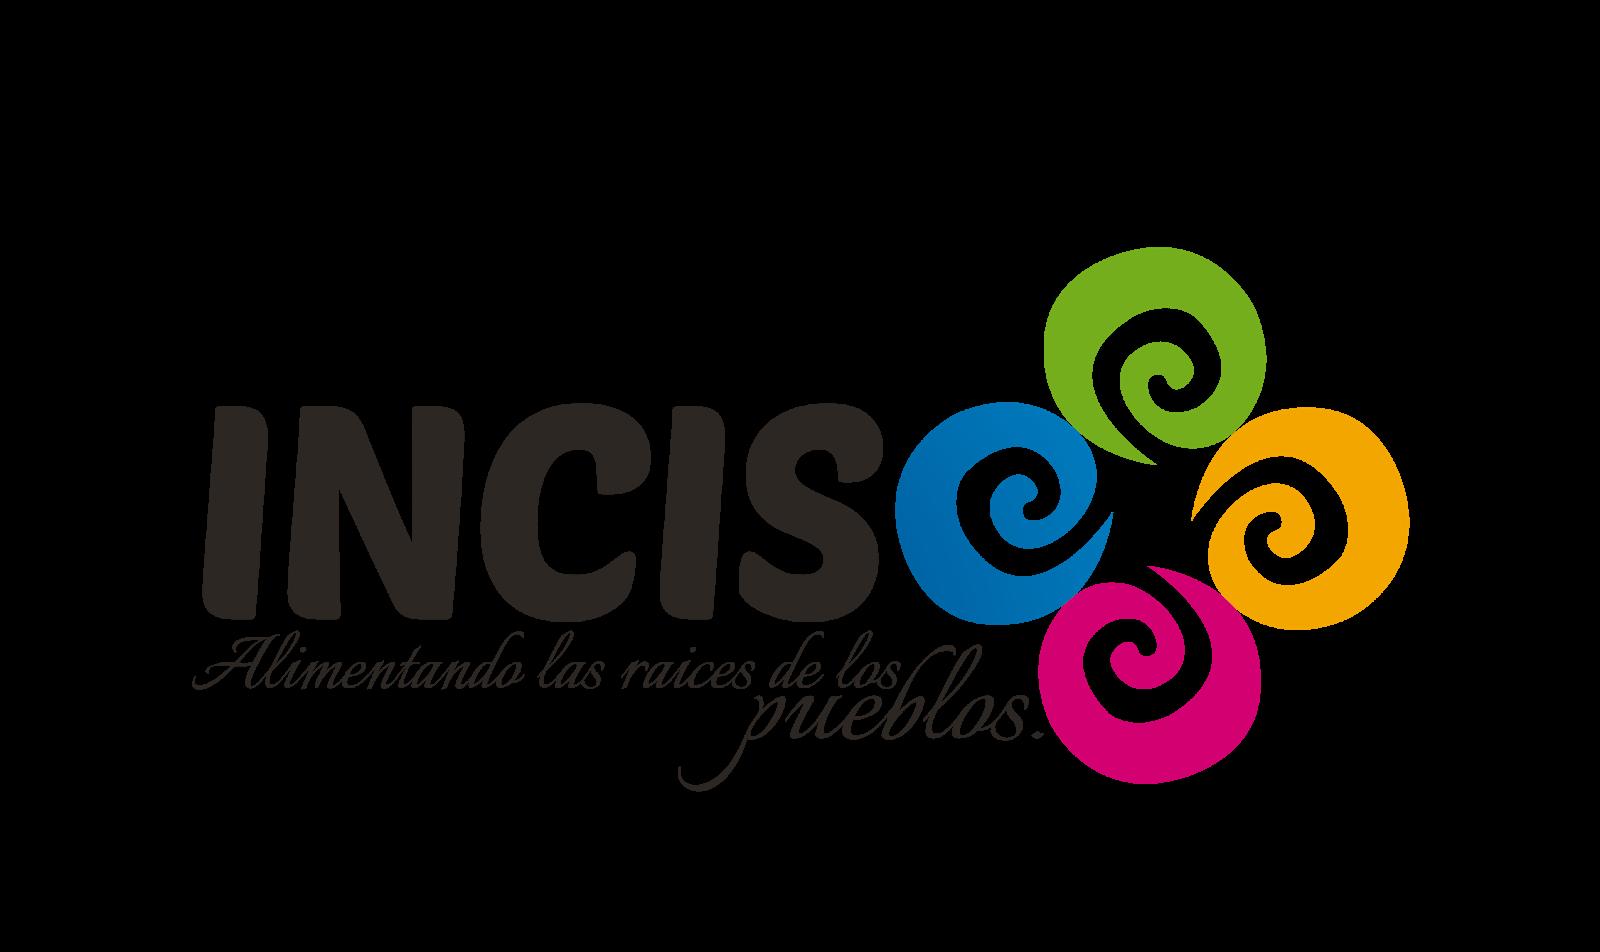 Municipio de la red INCISO